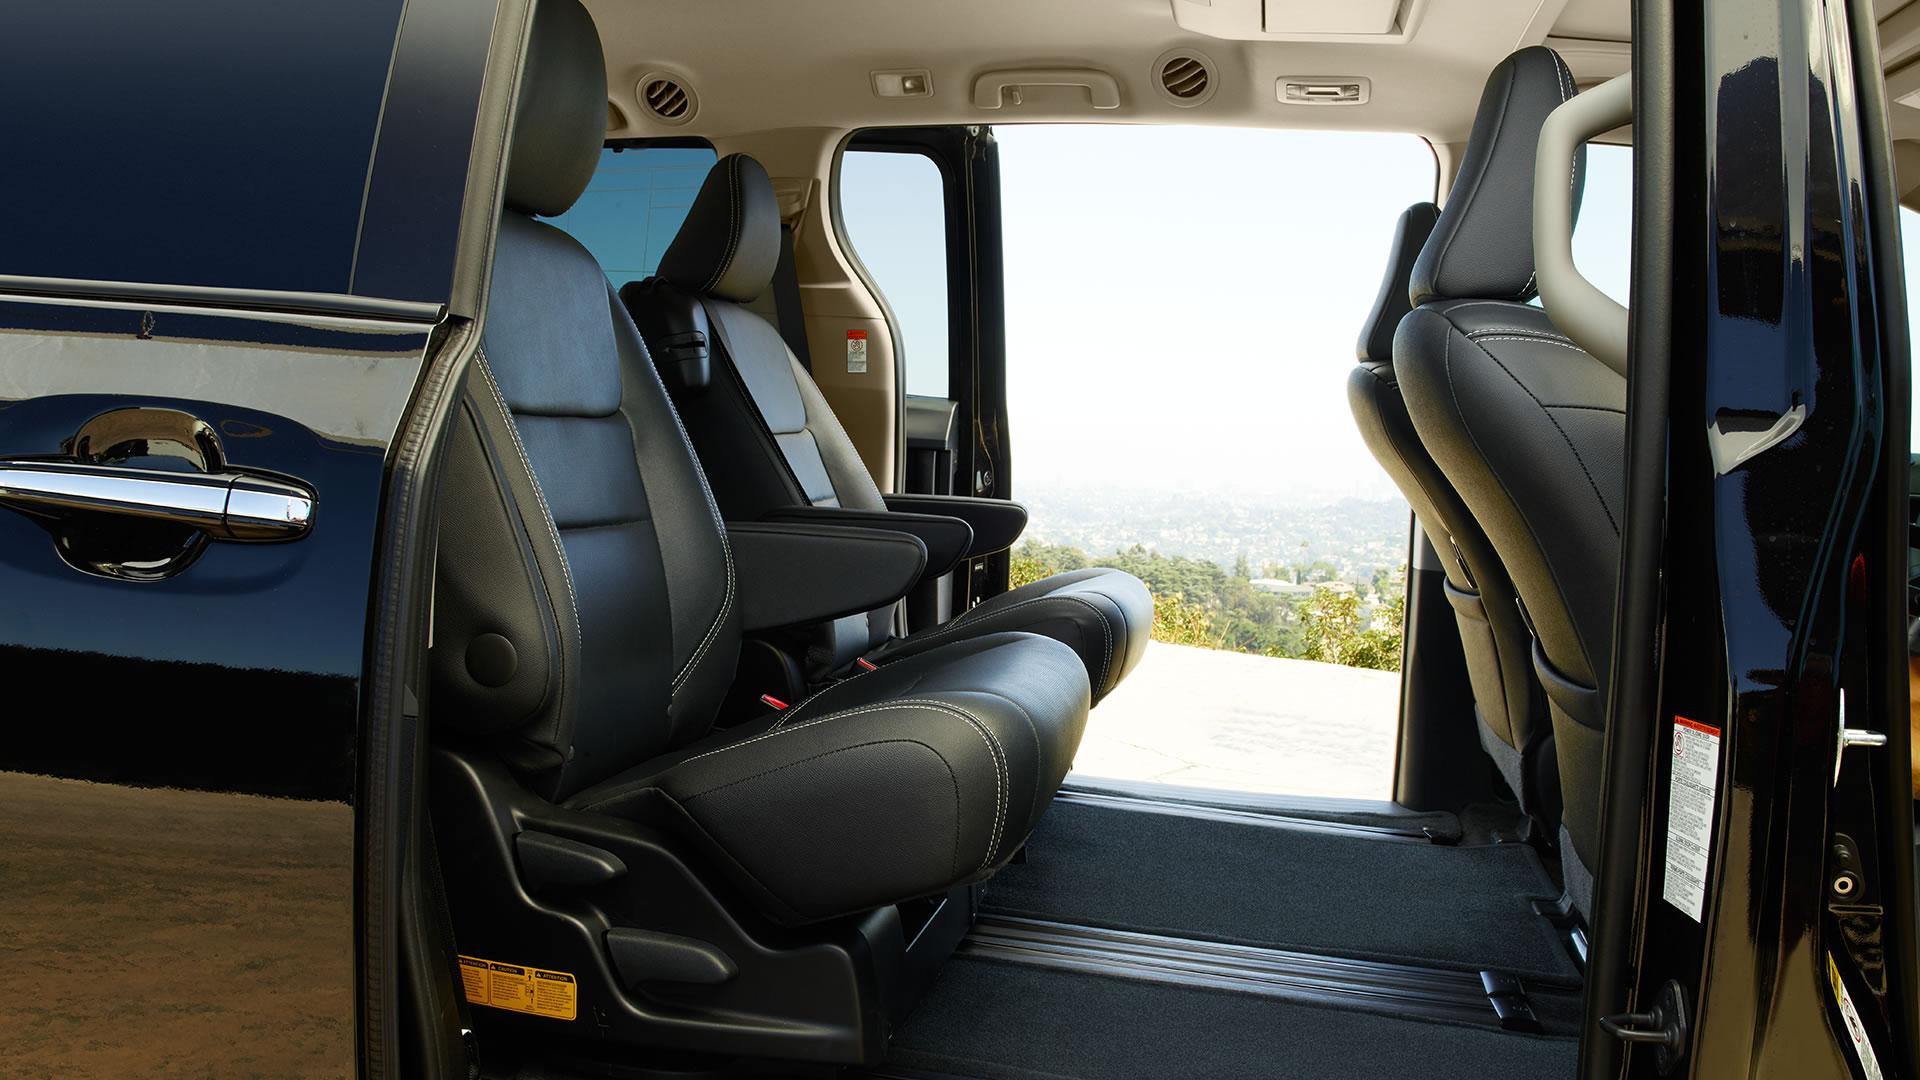 Toyota Sienna Service Manual: Disposal